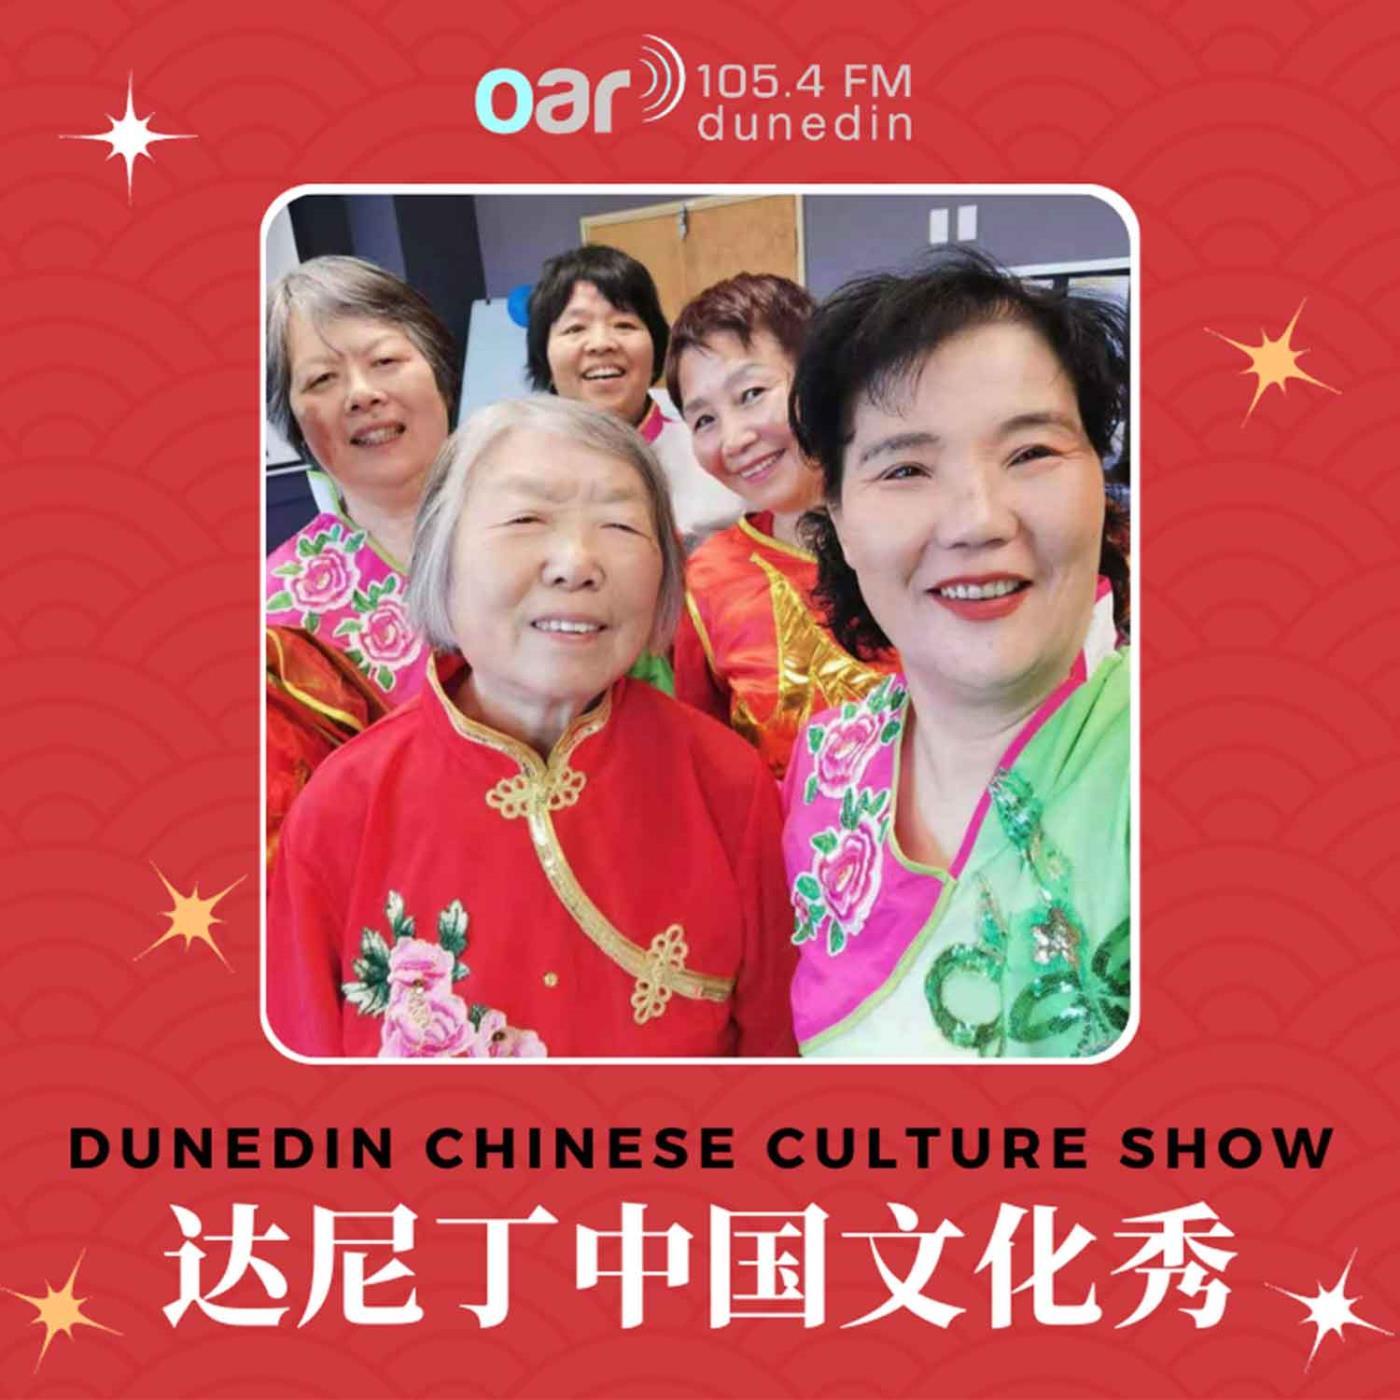 Dunedin Chinese Culture Show